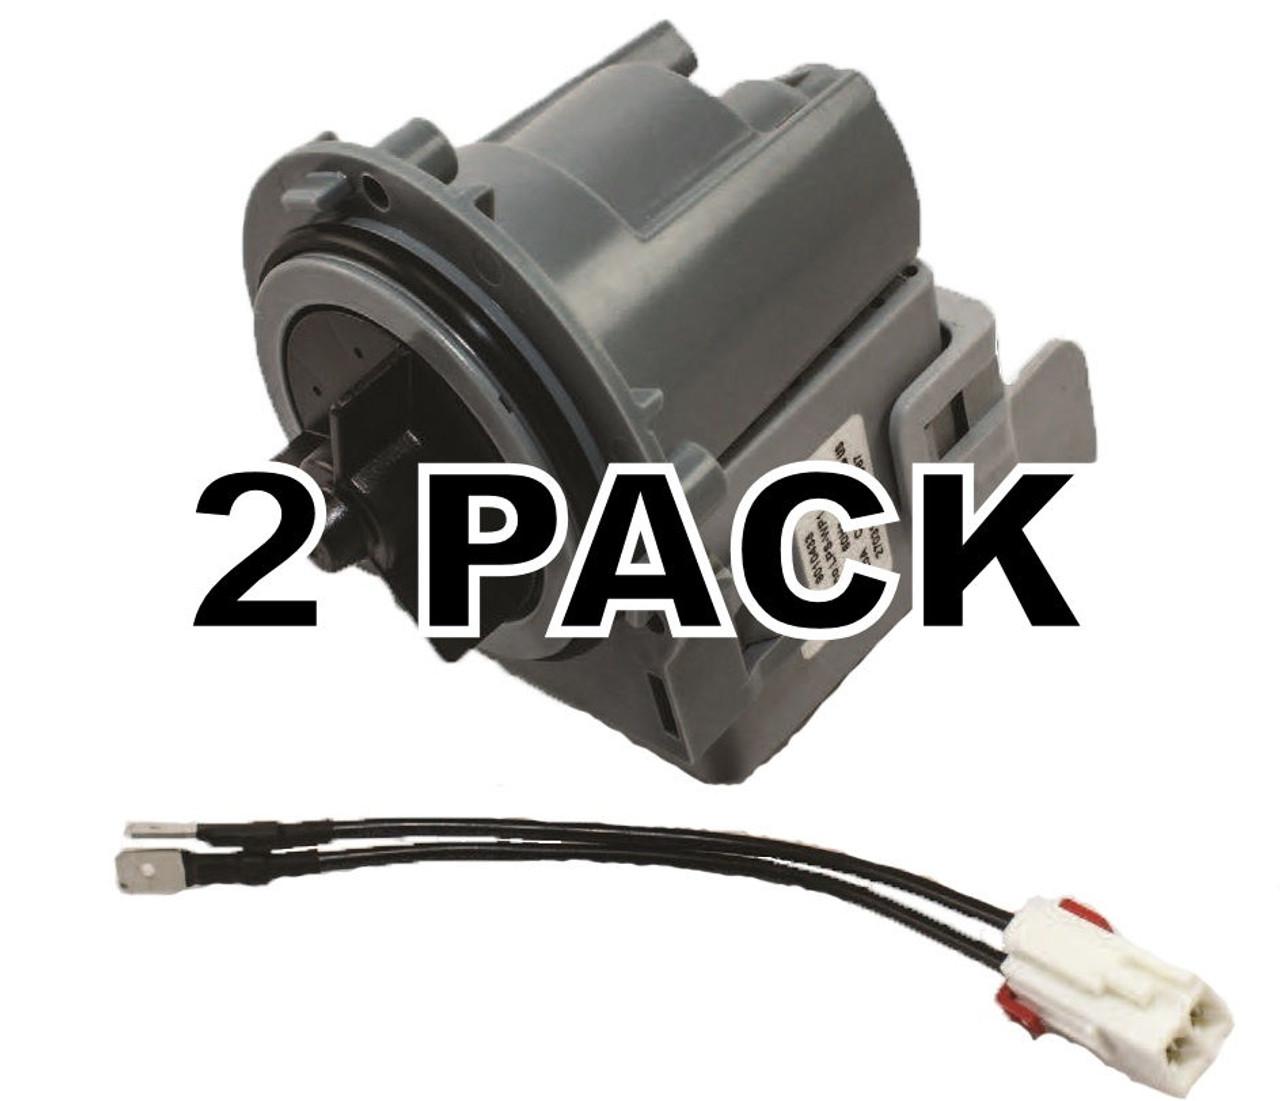 2 Pk, Universal Washing Machine Drain Pump for Frigidaire, GE, Whirlpool,  DP1 - Seneca River Trading, Inc.   Ge Washing Machine Pump Wiring      Seneca River Trading, Inc.